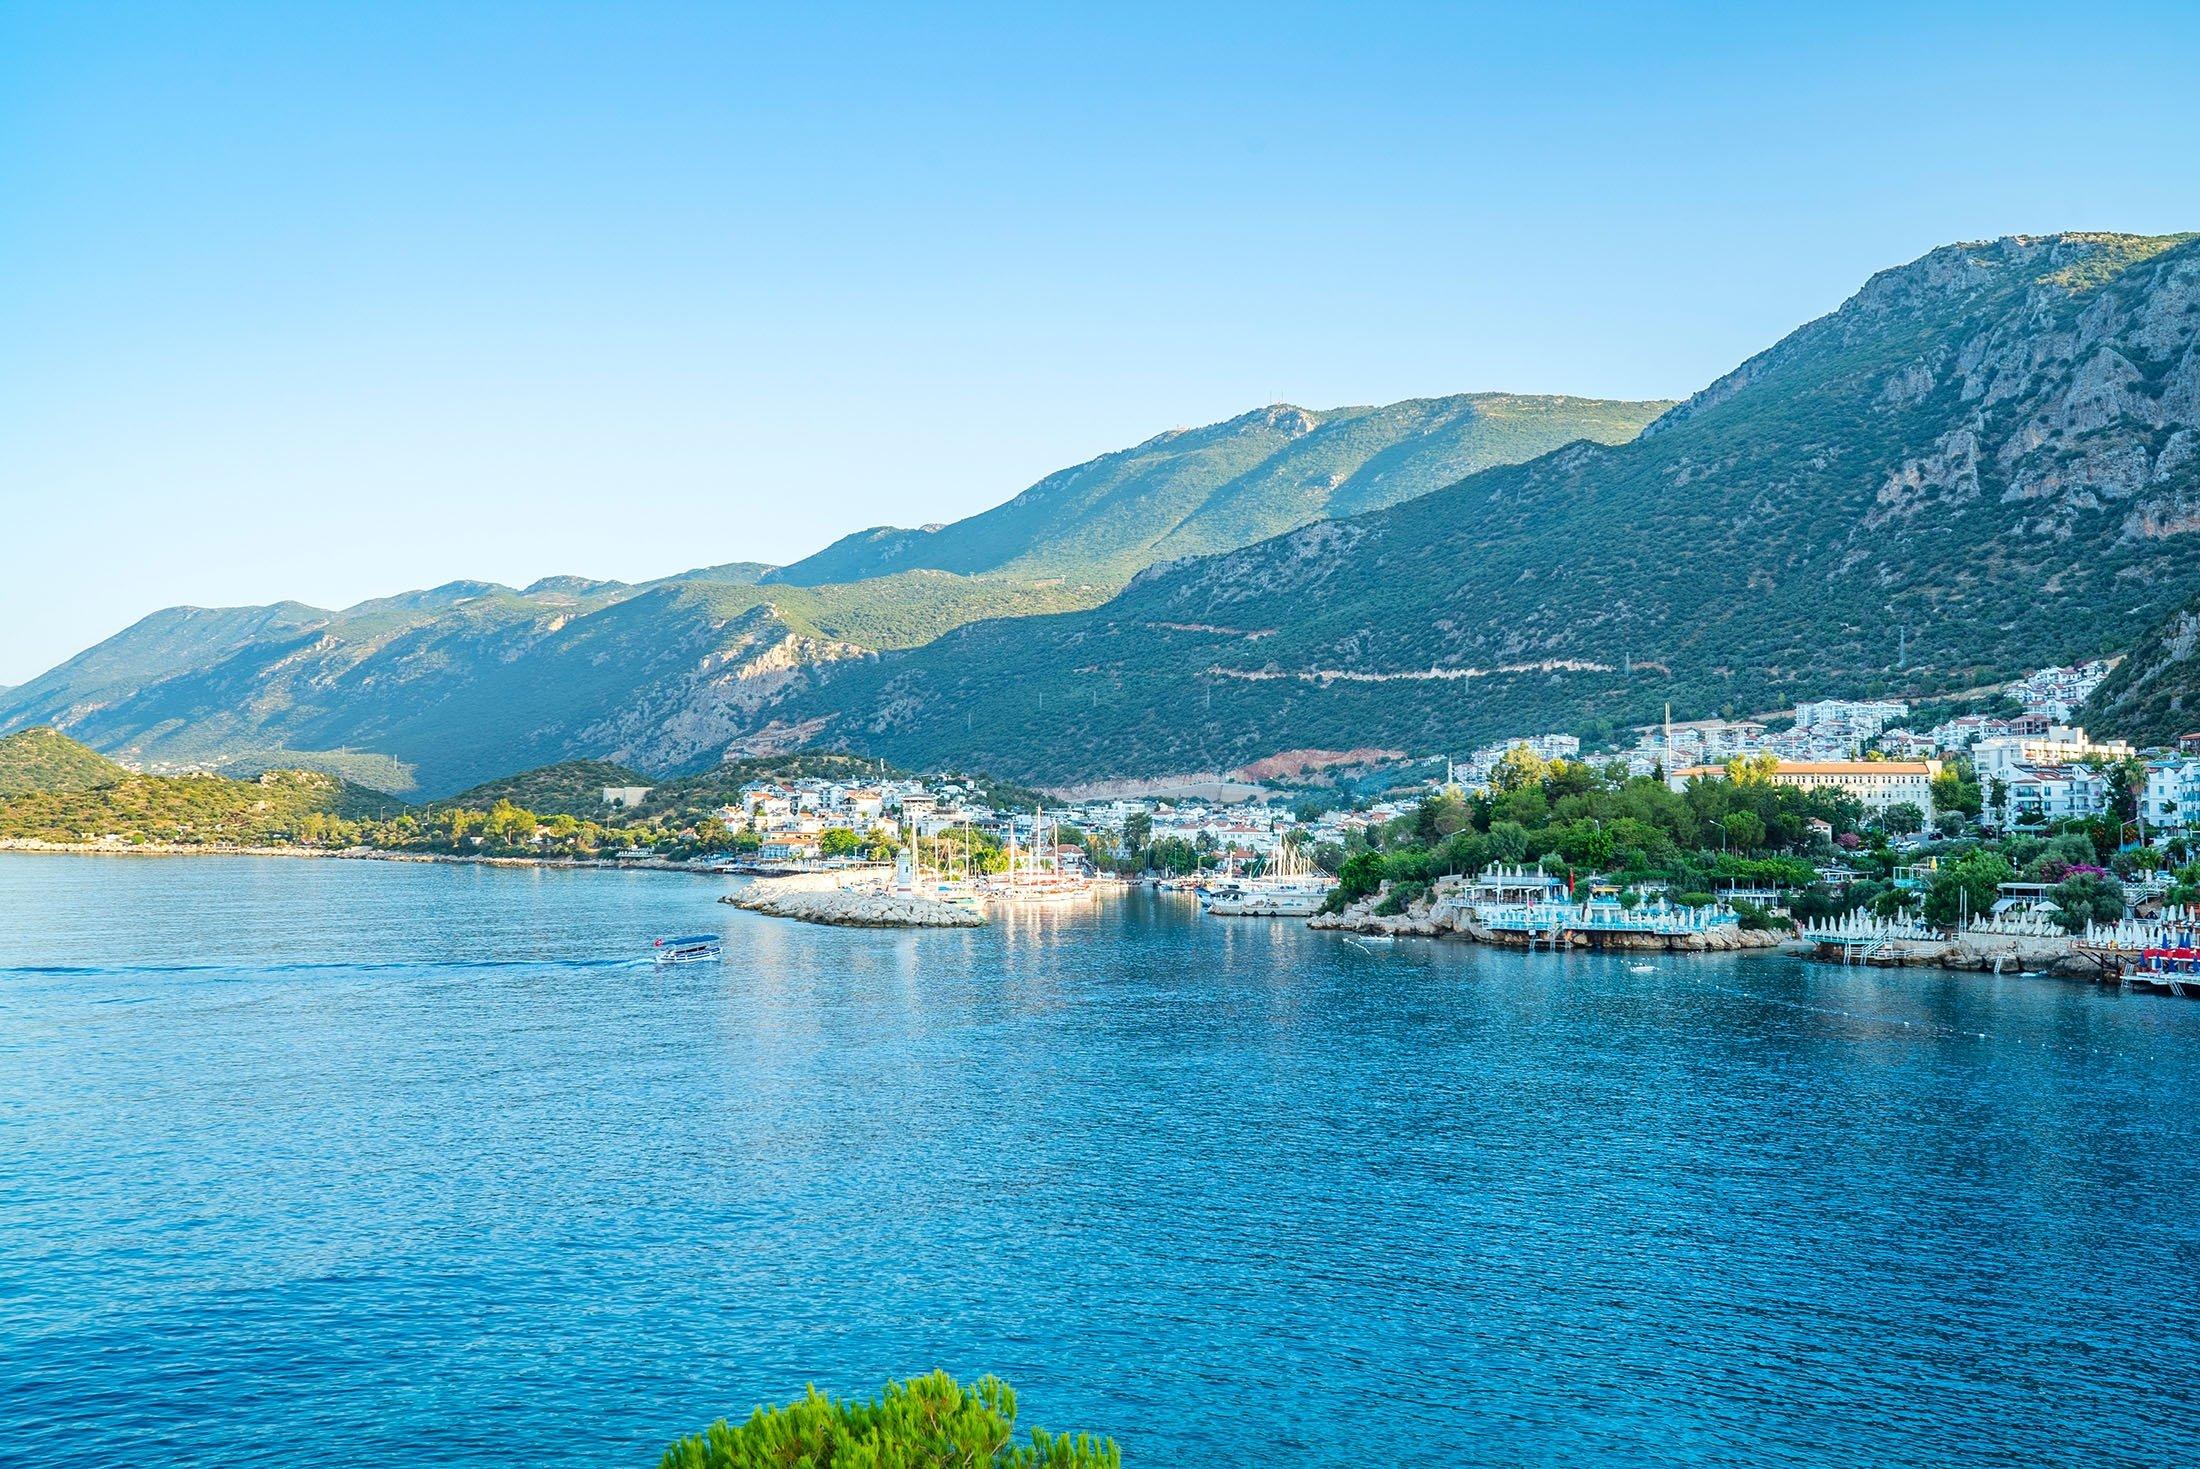 The resort town of Kaş in Turkey. (Shutterstock Photo)